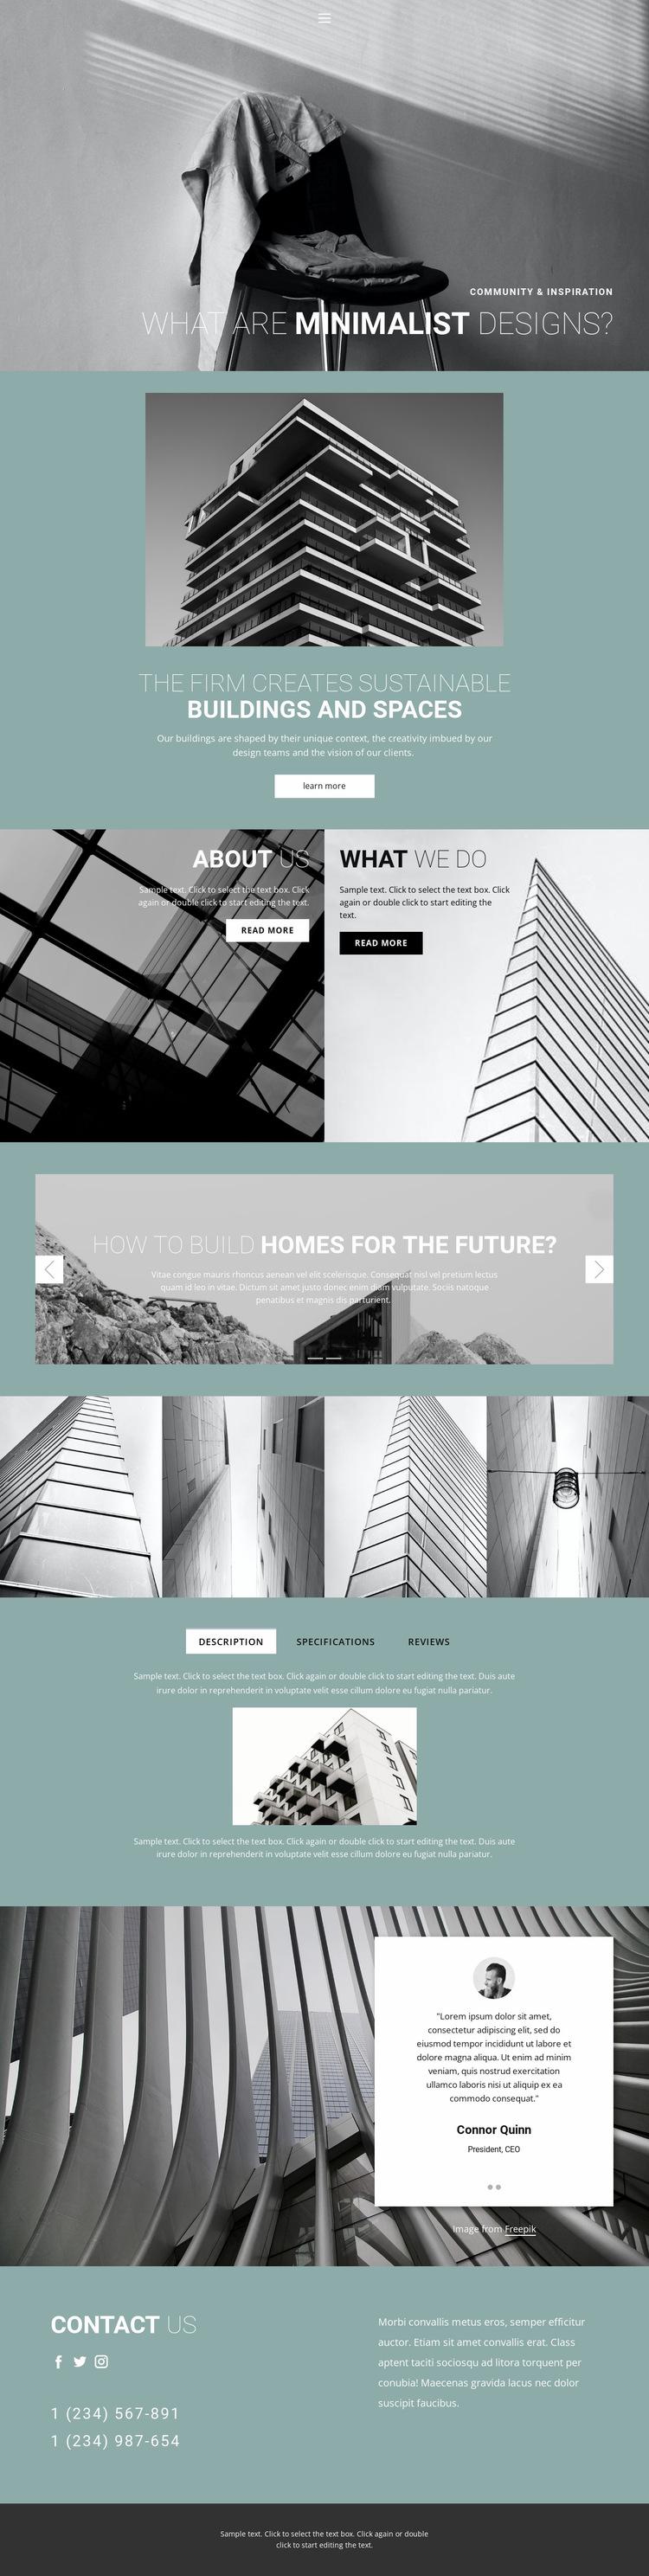 Perfect architecture ideas Website Builder